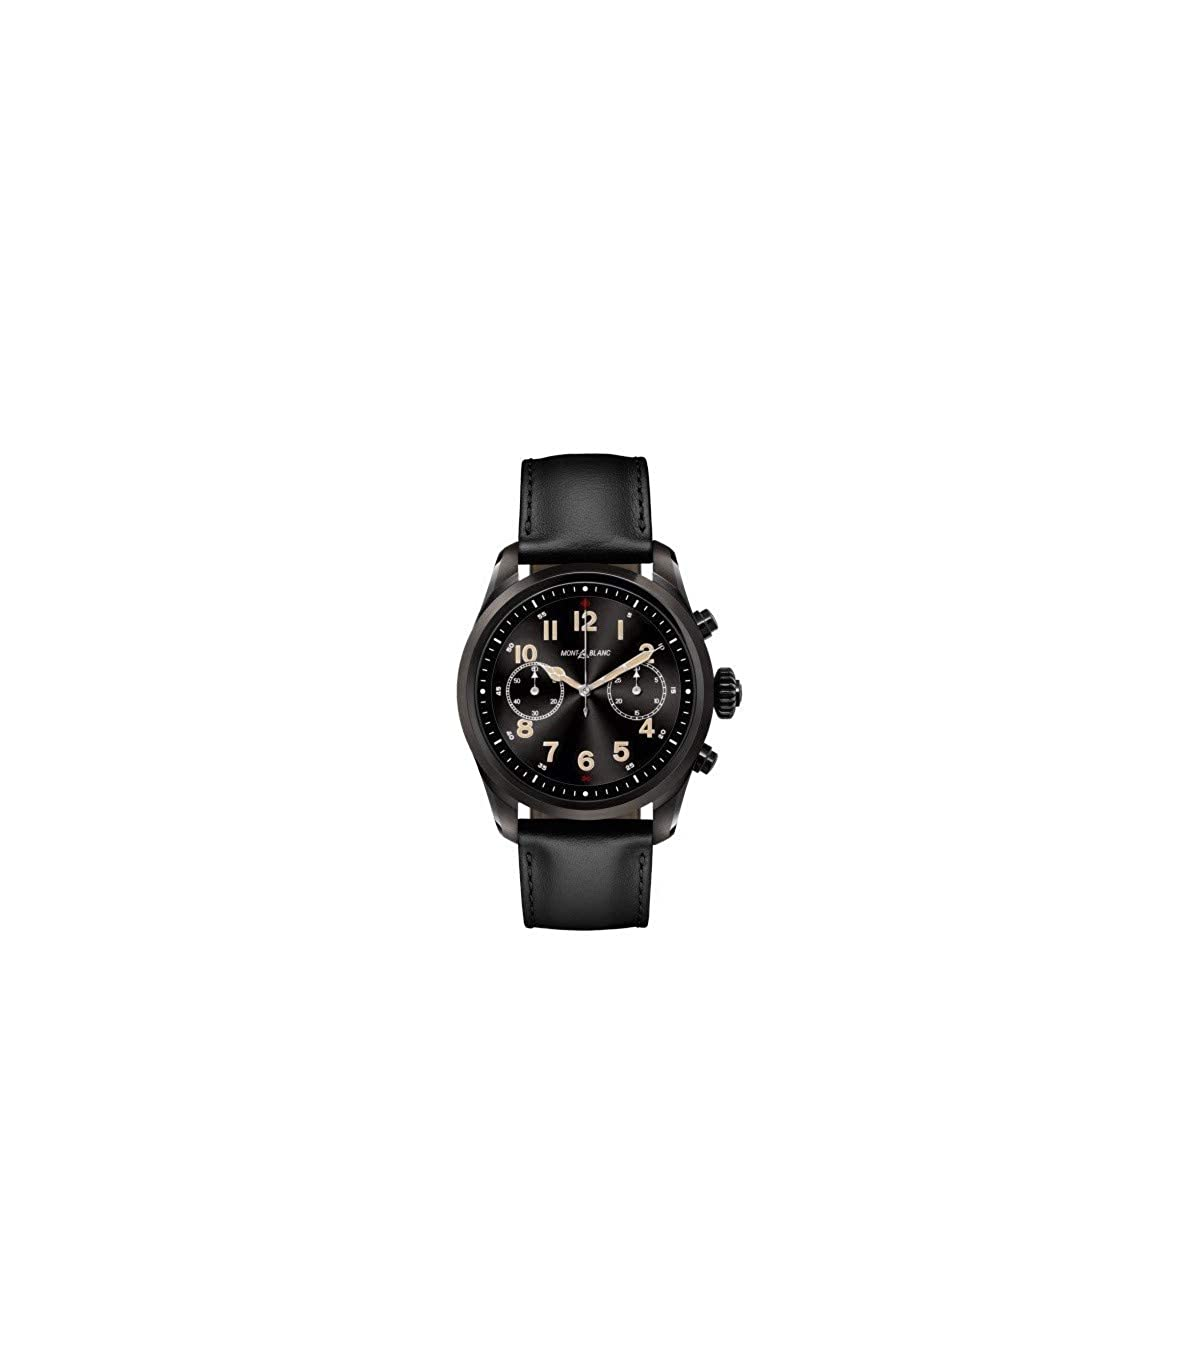 Reloj Montblanc Summit 2 Smartwatch 119438 Acero Negro Piel ...